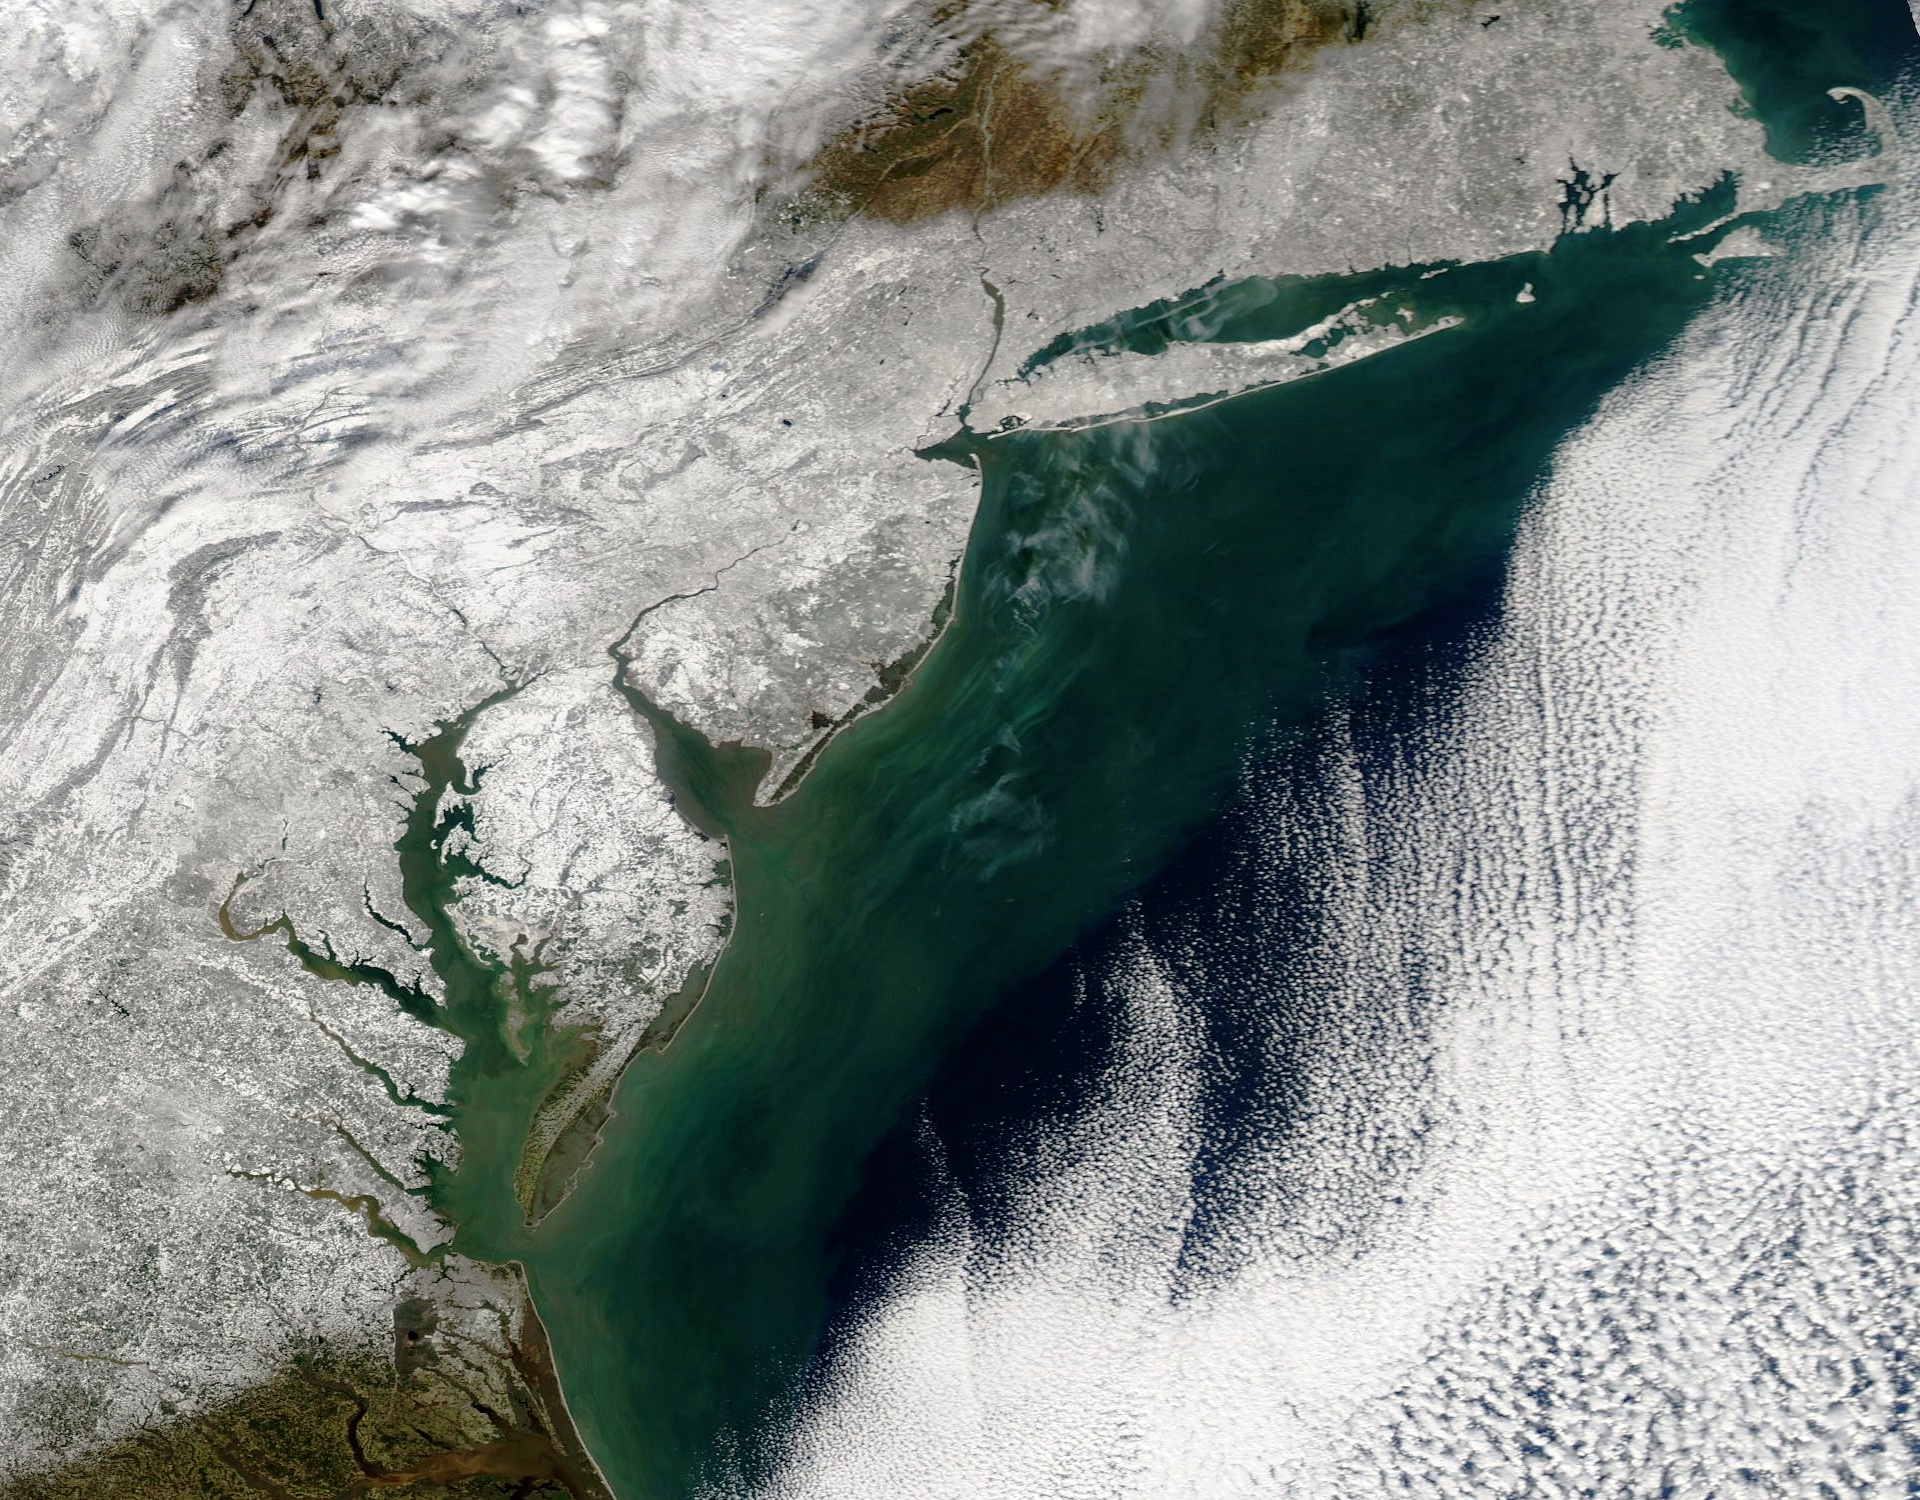 Snowzilla - Tempête de neige - New York - Washington - Côte est - Aqua - MODIS - NASA